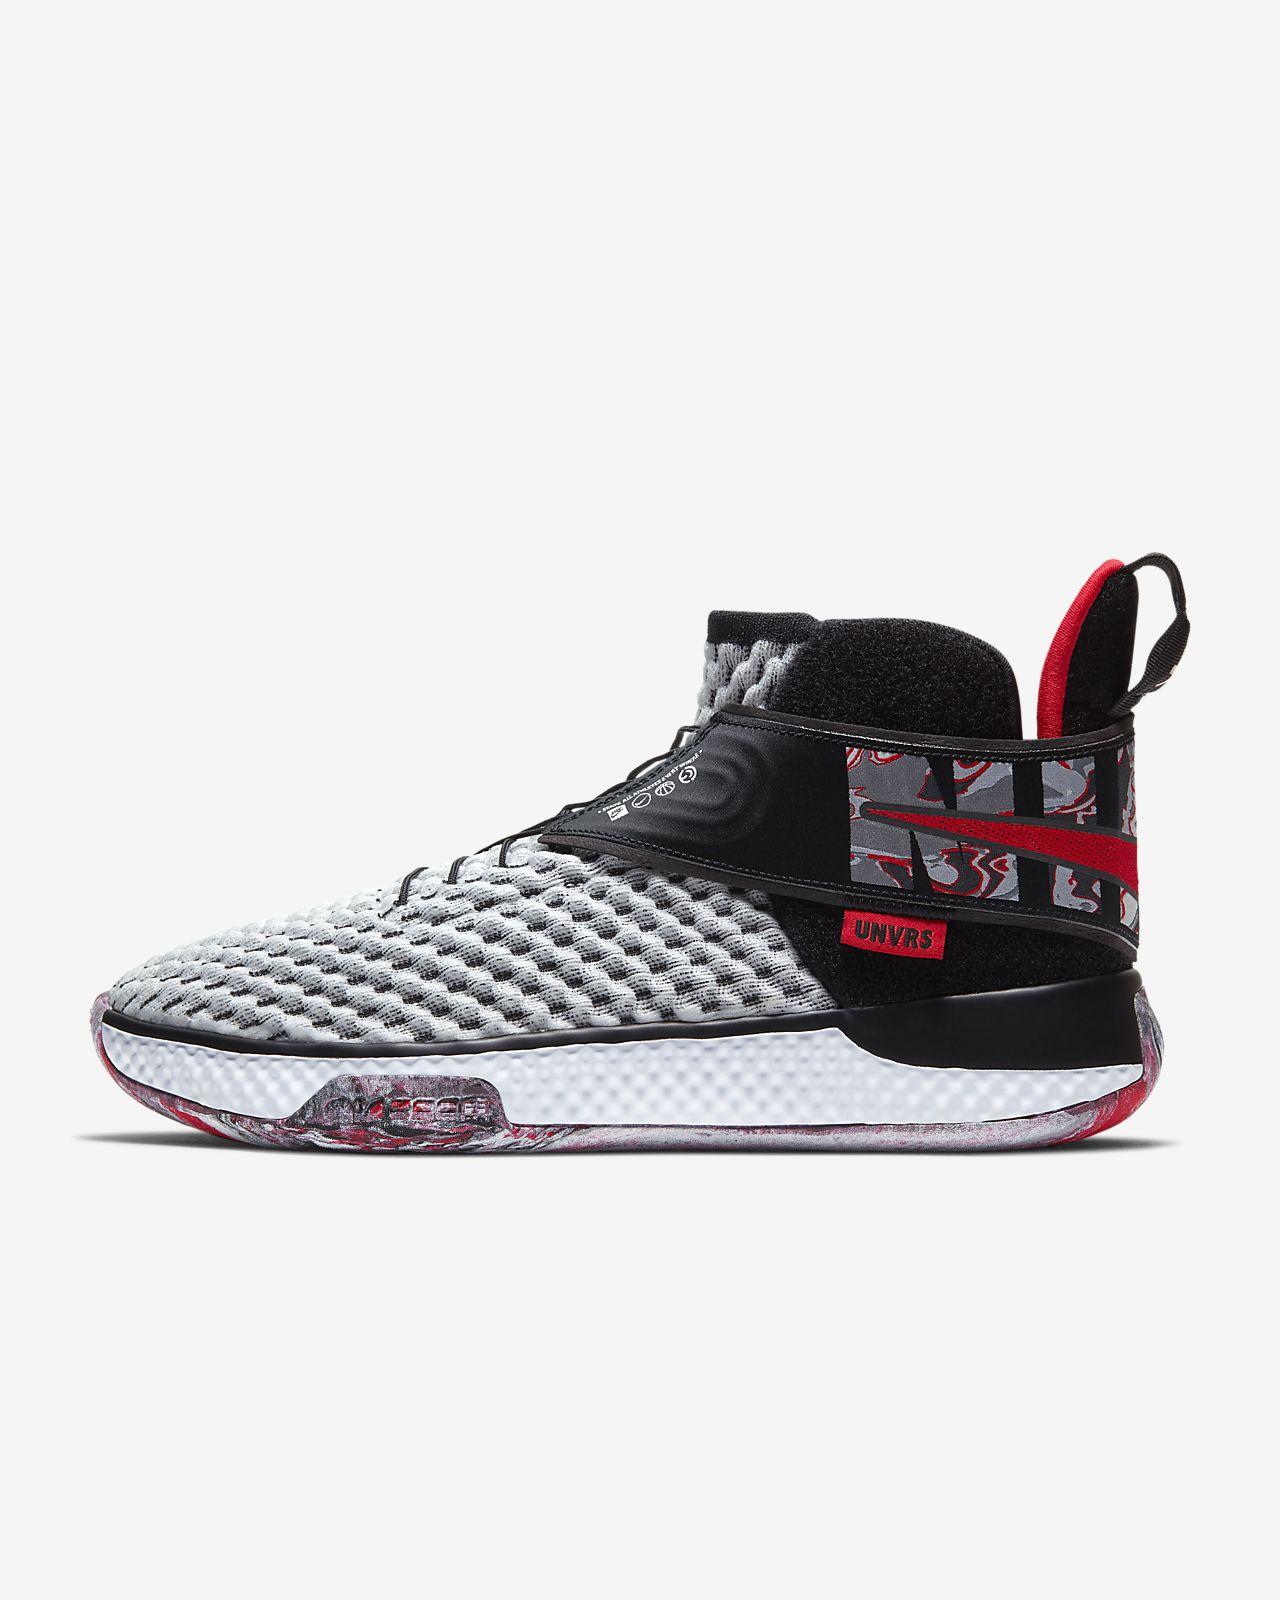 Sconto Chaussures Basket | 2019 Chaussures Basket in vendita